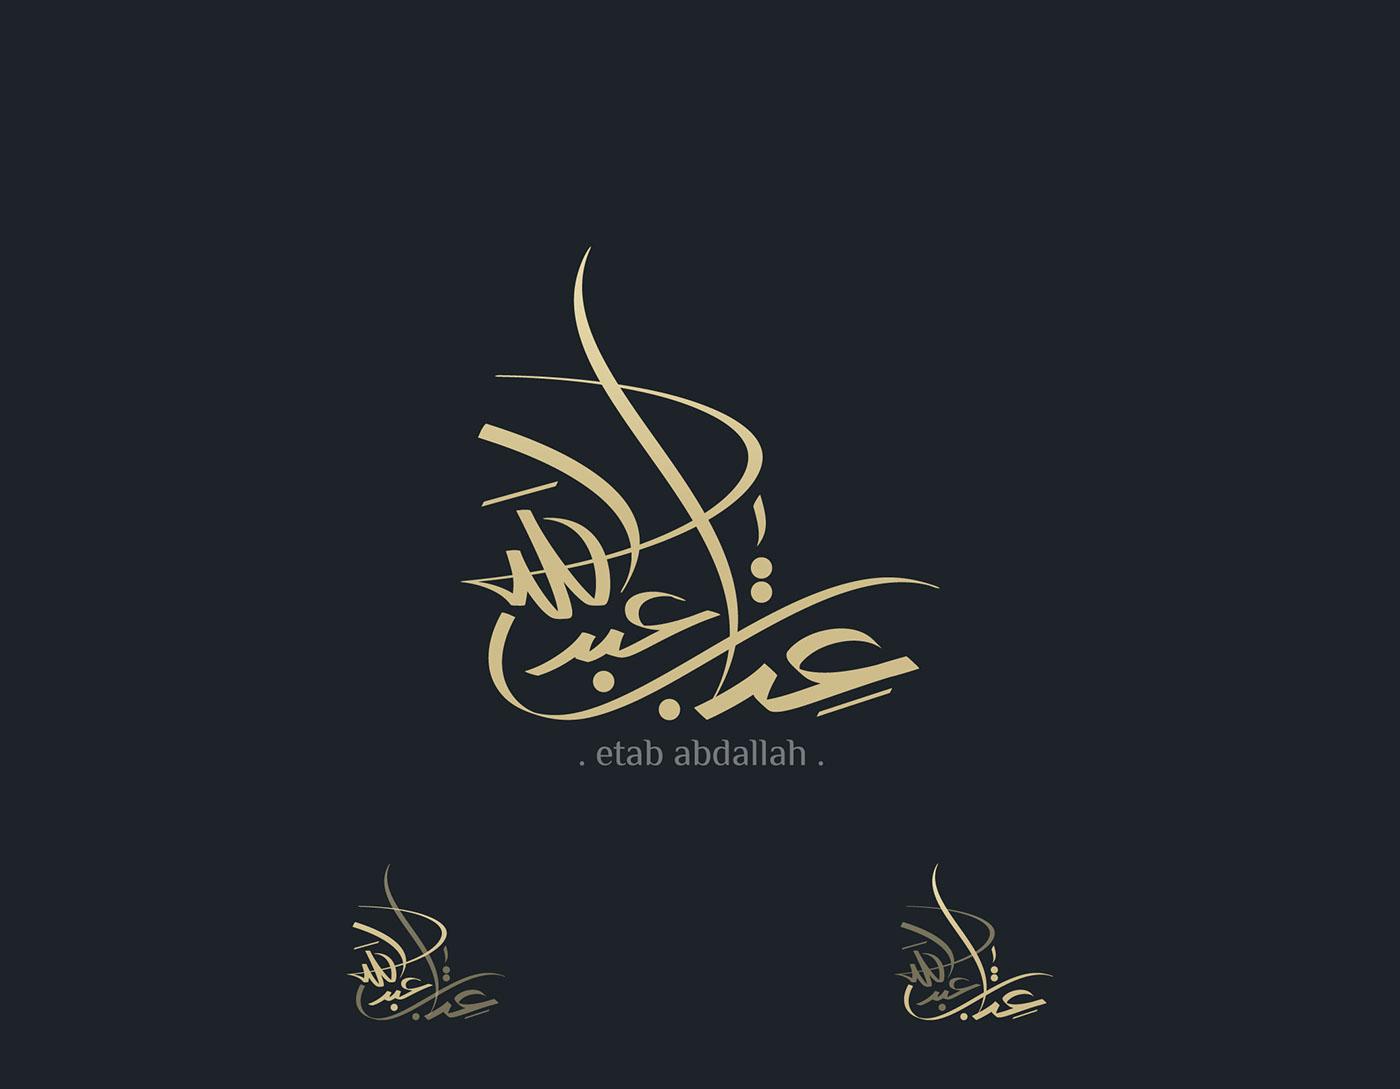 Qaf Studio arabic calligraphy Arabic Logos islamic art Arabesque mahdy qaf arabic branding Arabian Branding egypt logos arabic typography hand writing Arabic Script modern calligraphy